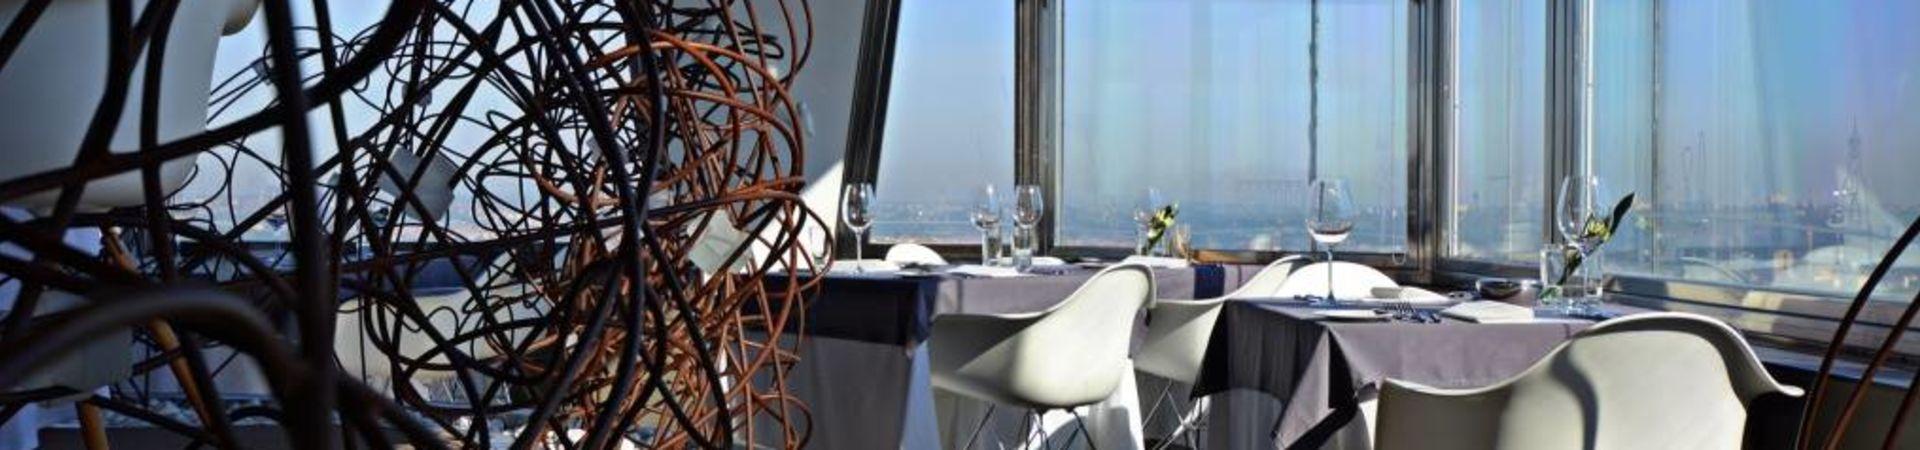 Tower Park Praha - Restaurace Oblaca